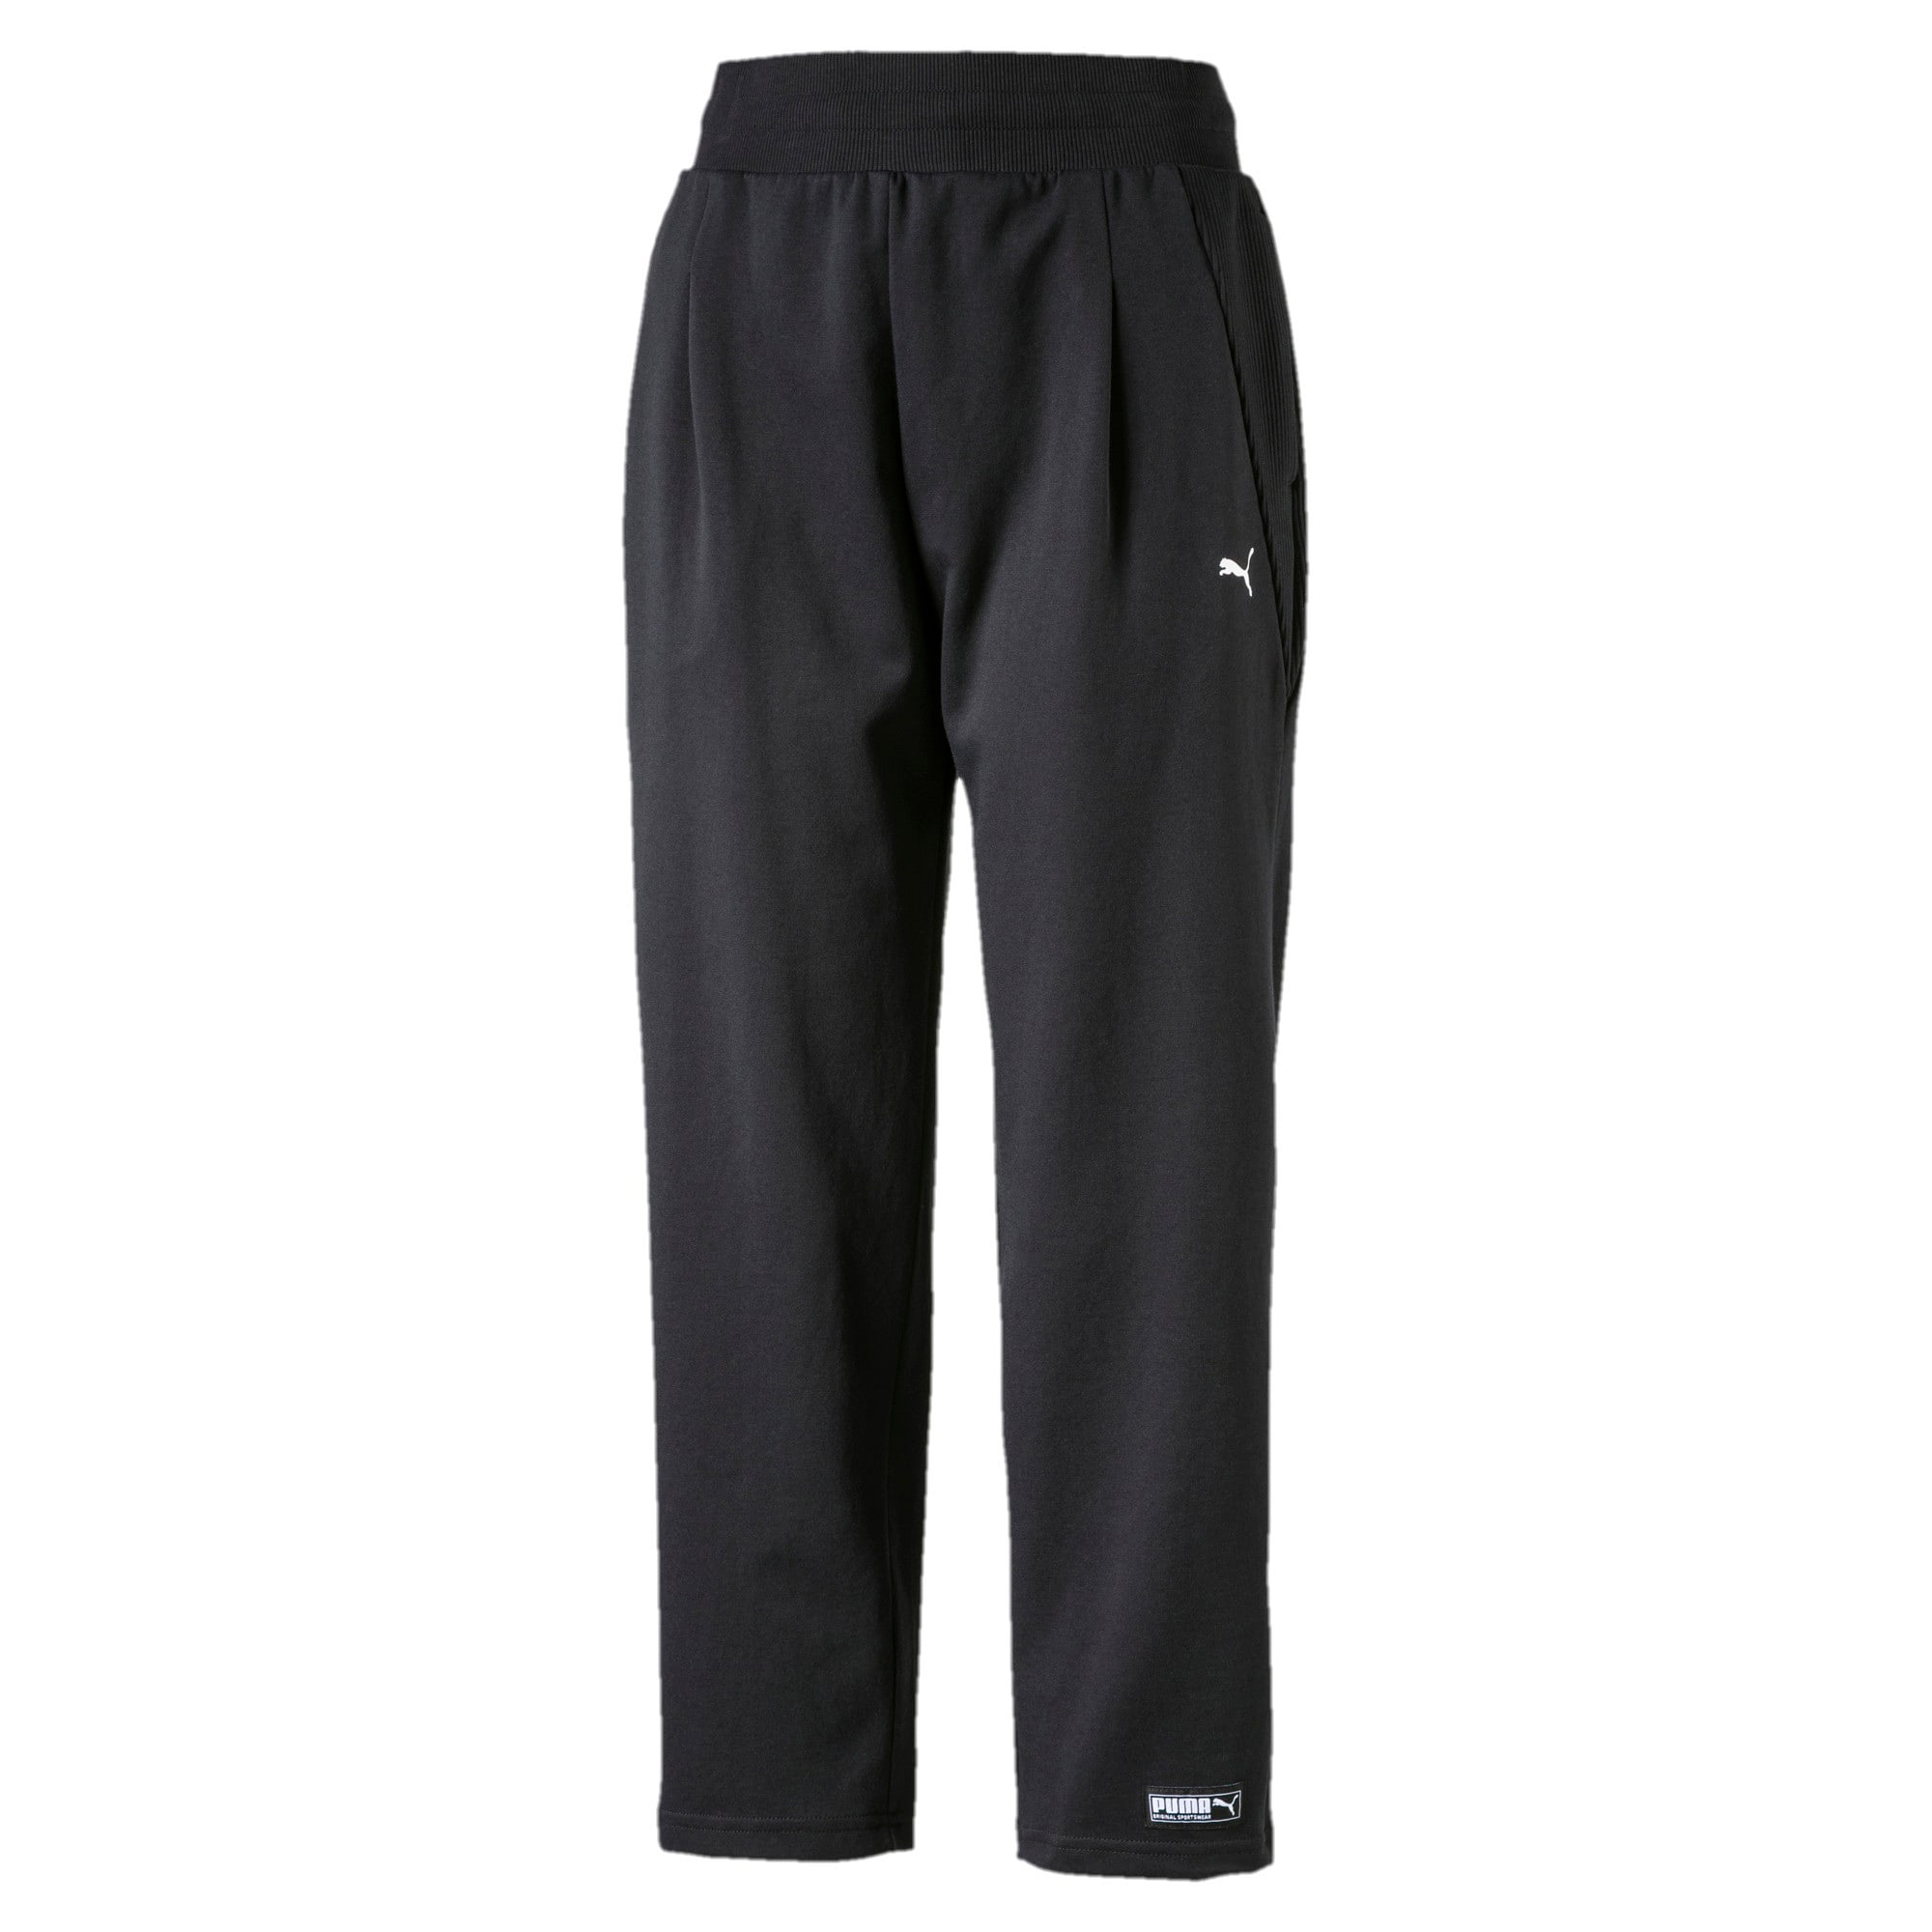 Thumbnail 4 of Fusion Pants, Cotton Black, medium